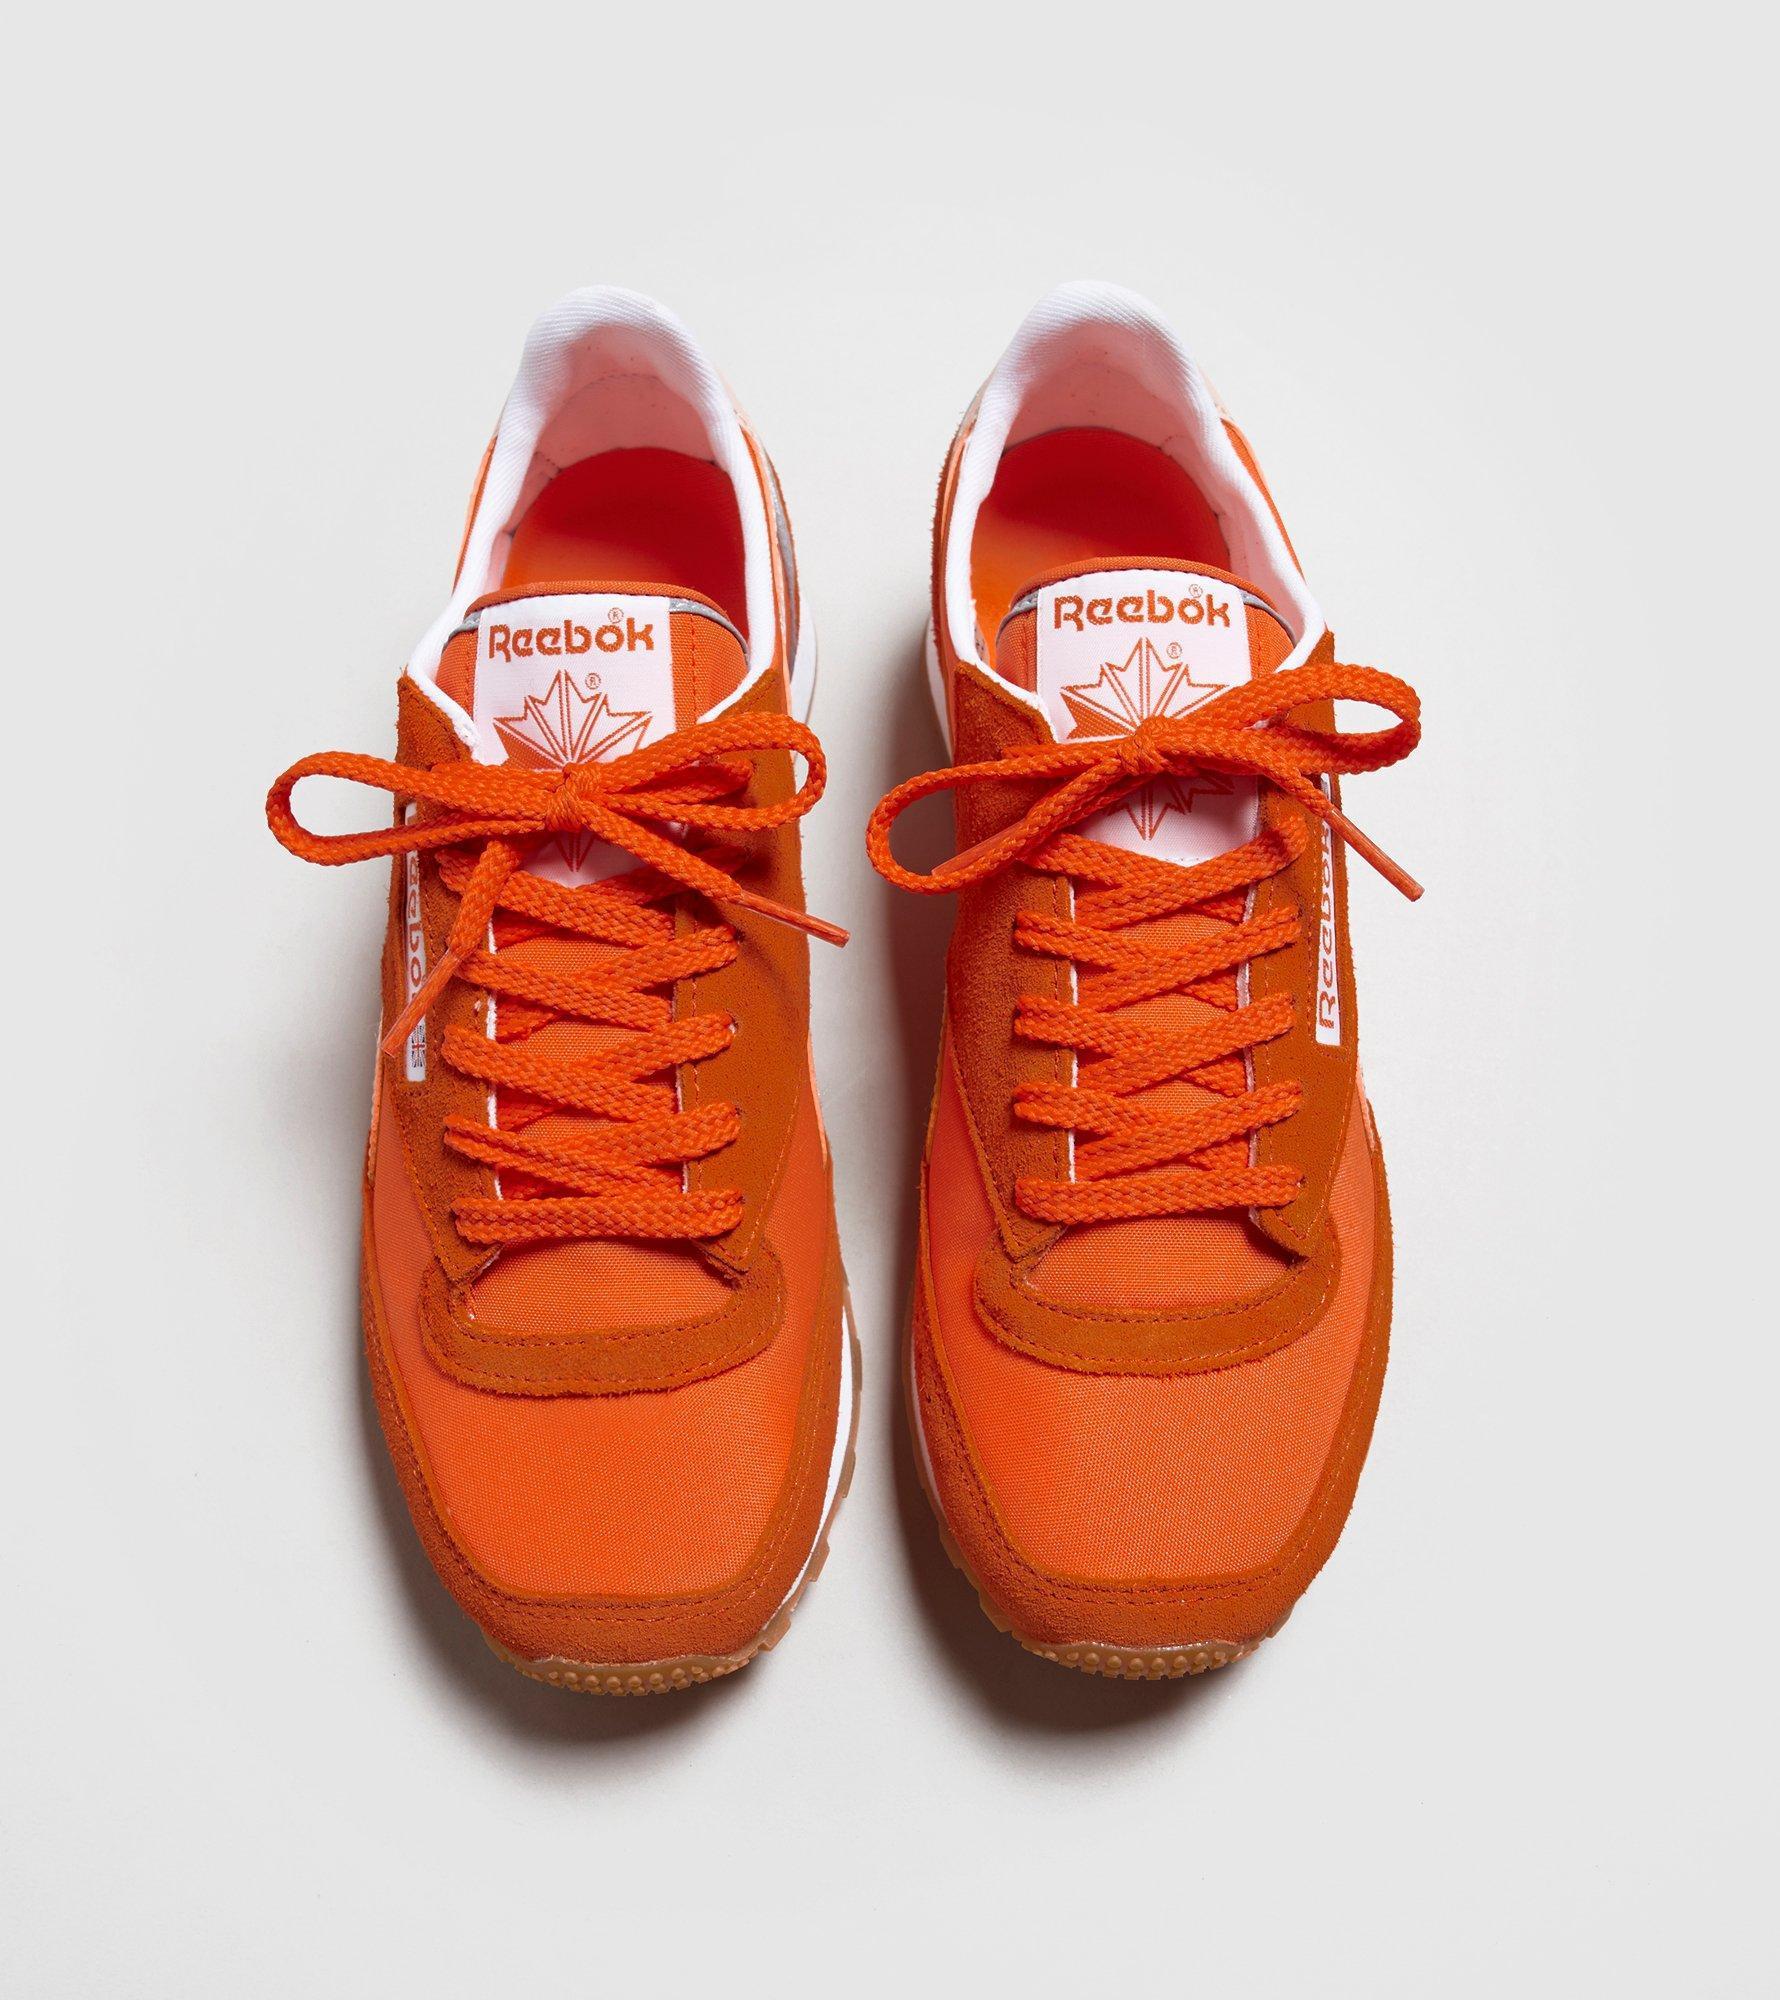 baf5c3d45e9 Lyst - Reebok Classic 83 - Size  Exclusive Women s in Orange